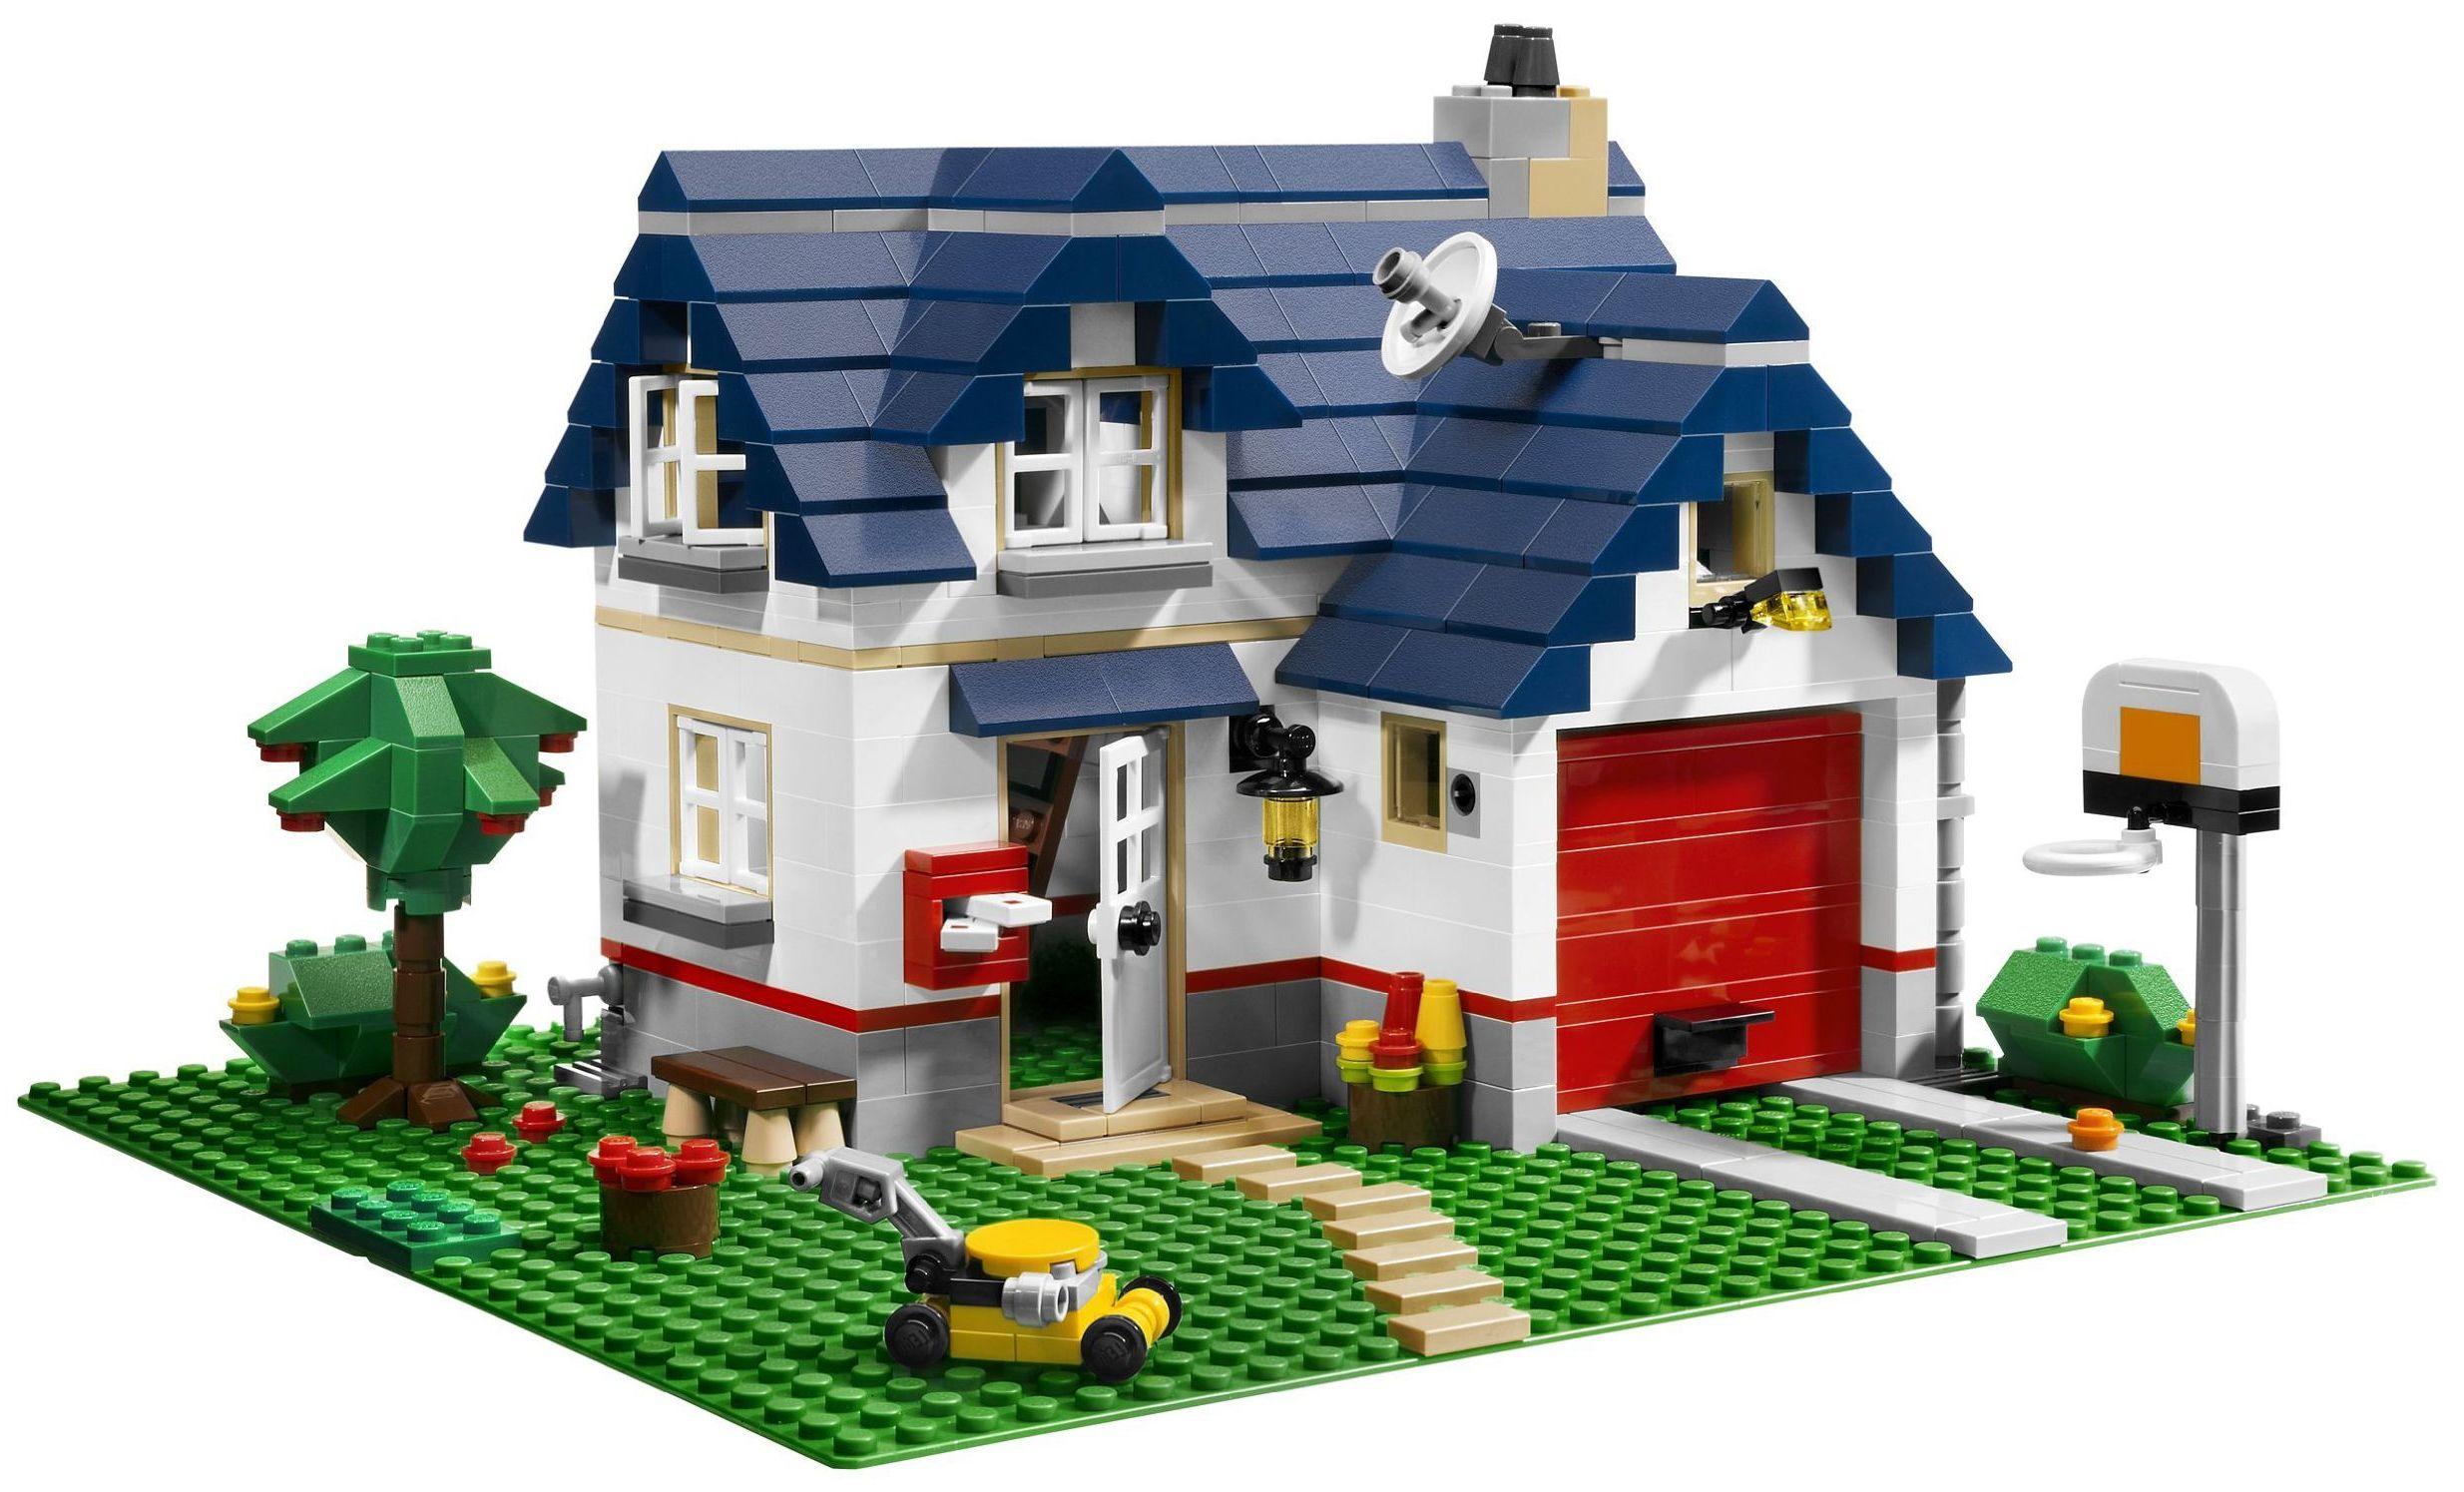 Lego house designs